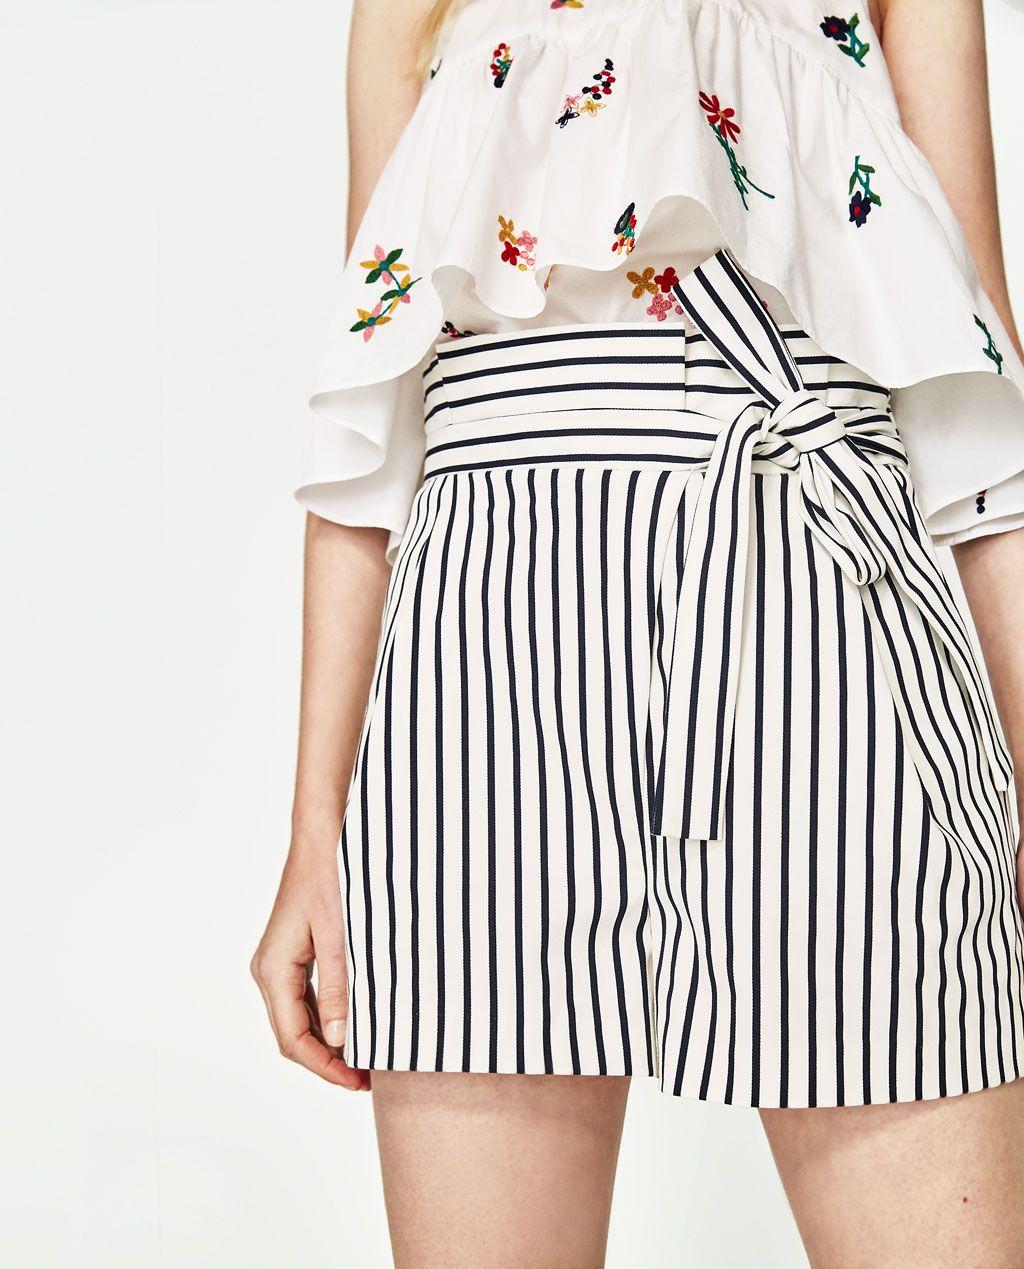 Stoffen Korte Broek Dames.Bermuda Met Plooien En Strik Shorts Dames Zara Nederland Mode In